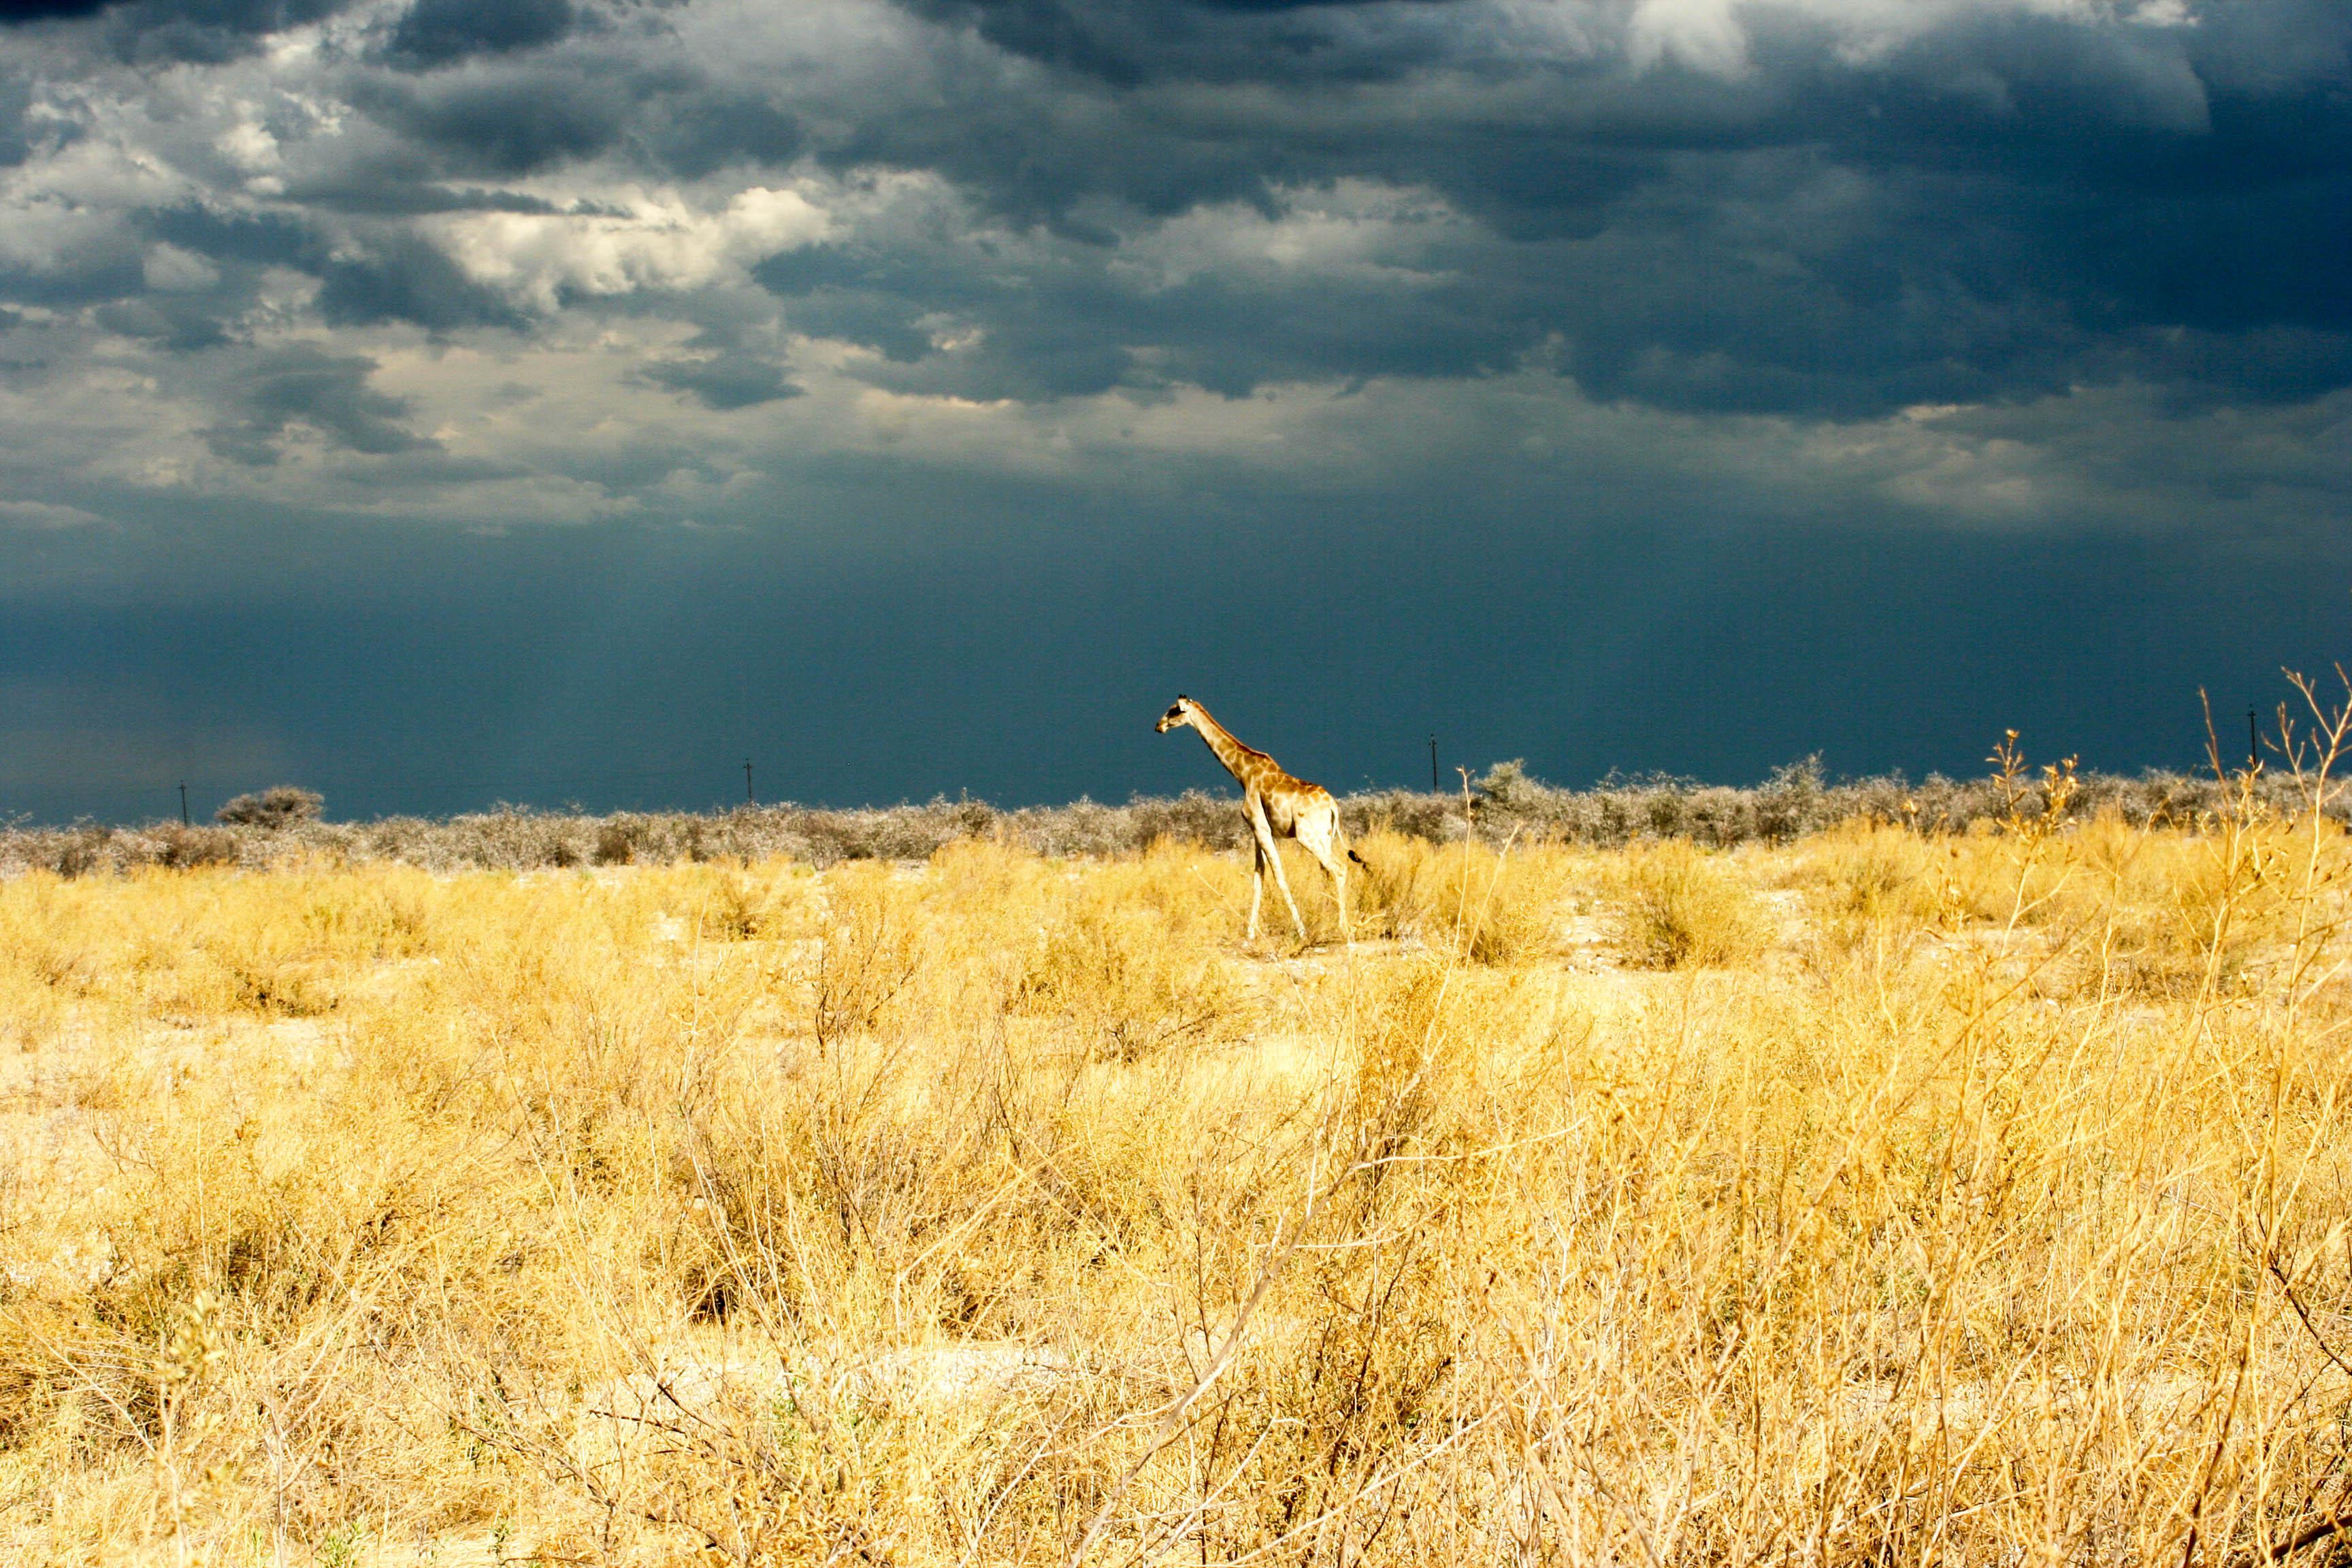 safari Afrique blog voyage la girafe qui vole